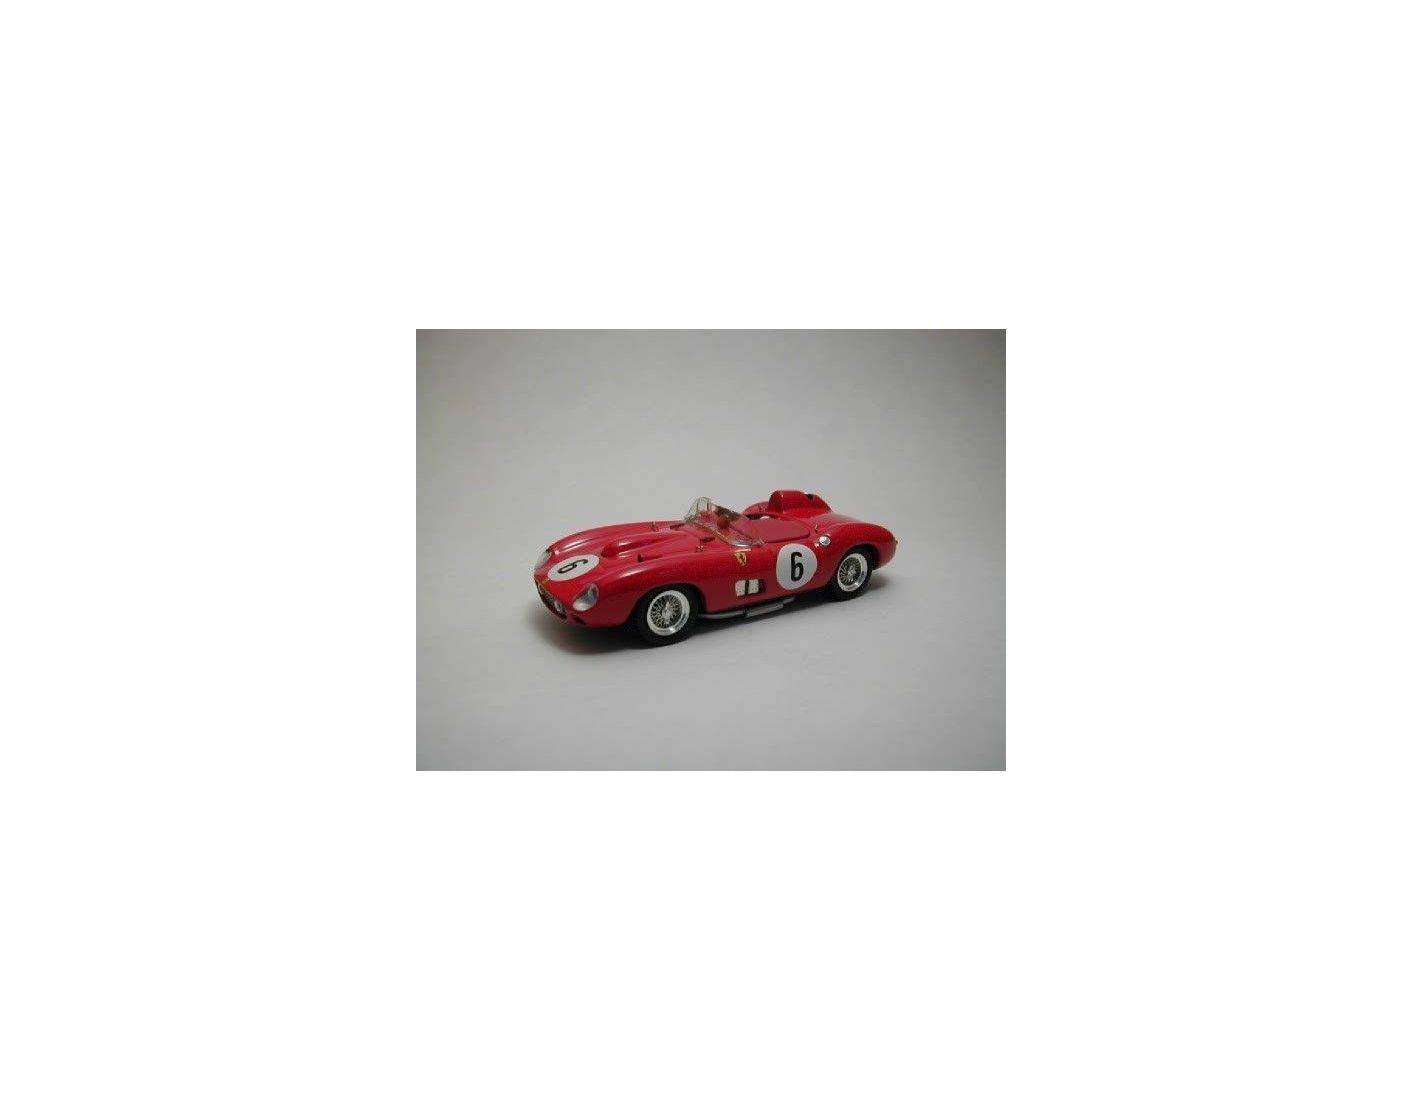 Art Model AM0170 FERRARI 335 S N.6 DNF LE MANS 1957 P.HILL-P.COLLINS 1:43 Modellino